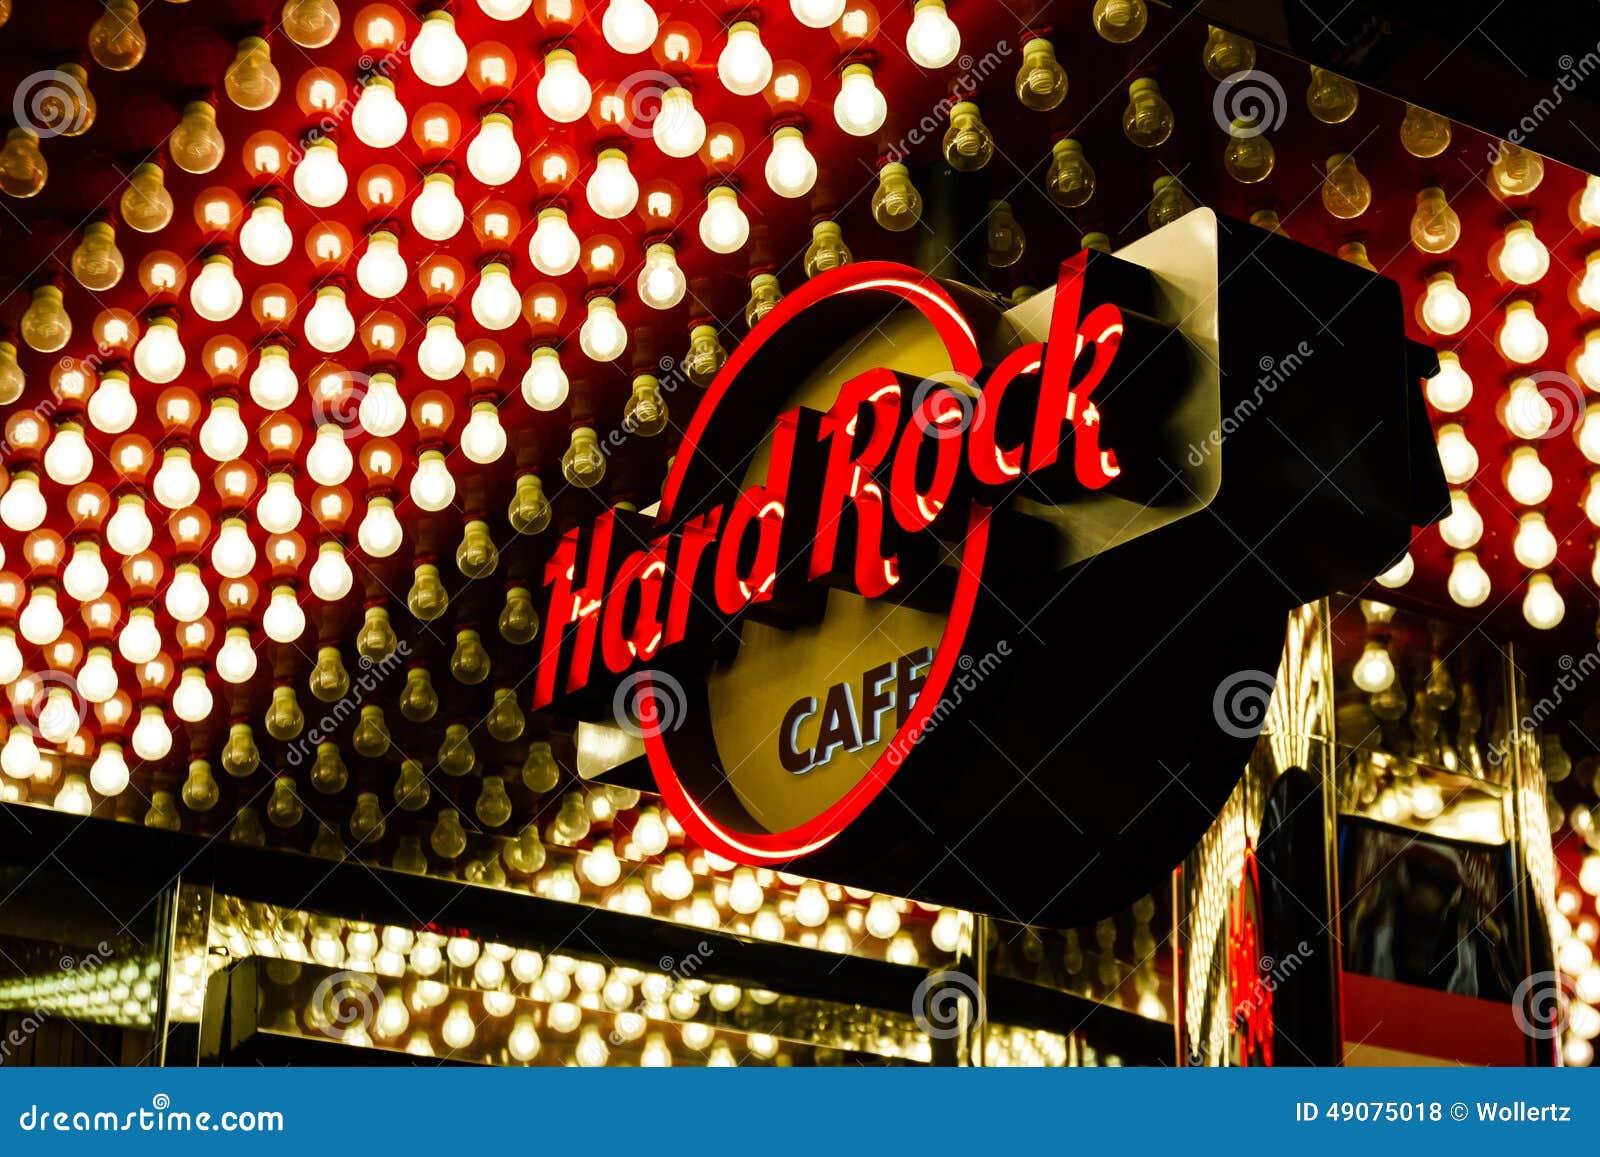 Hard Rock Cafe Food Prices